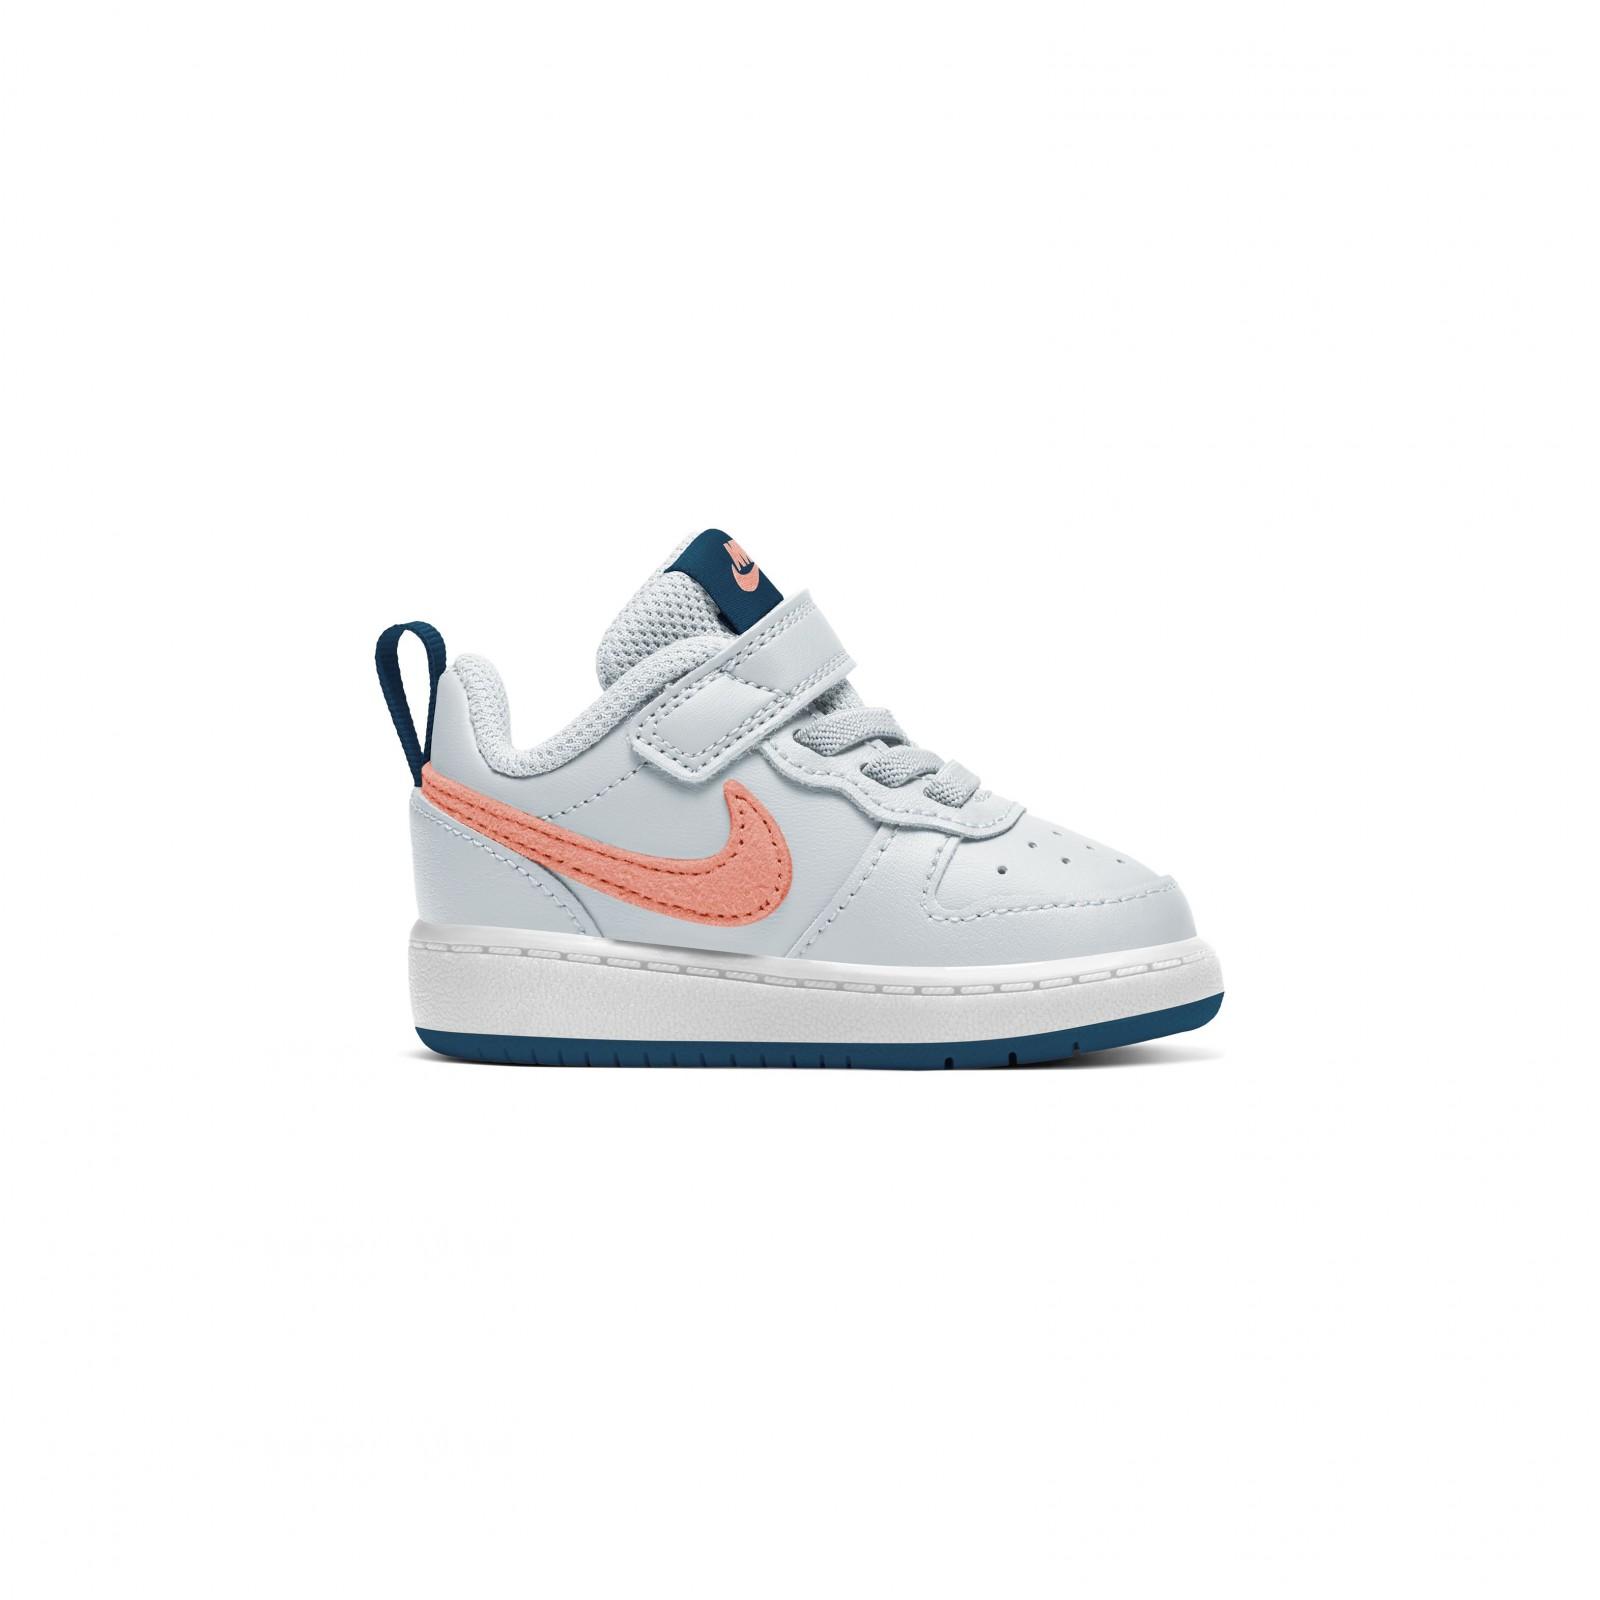 Nike court borough low 2 (tdv) PURE PLATINUM/ATOMIC PINK-VALERIAN BLUE